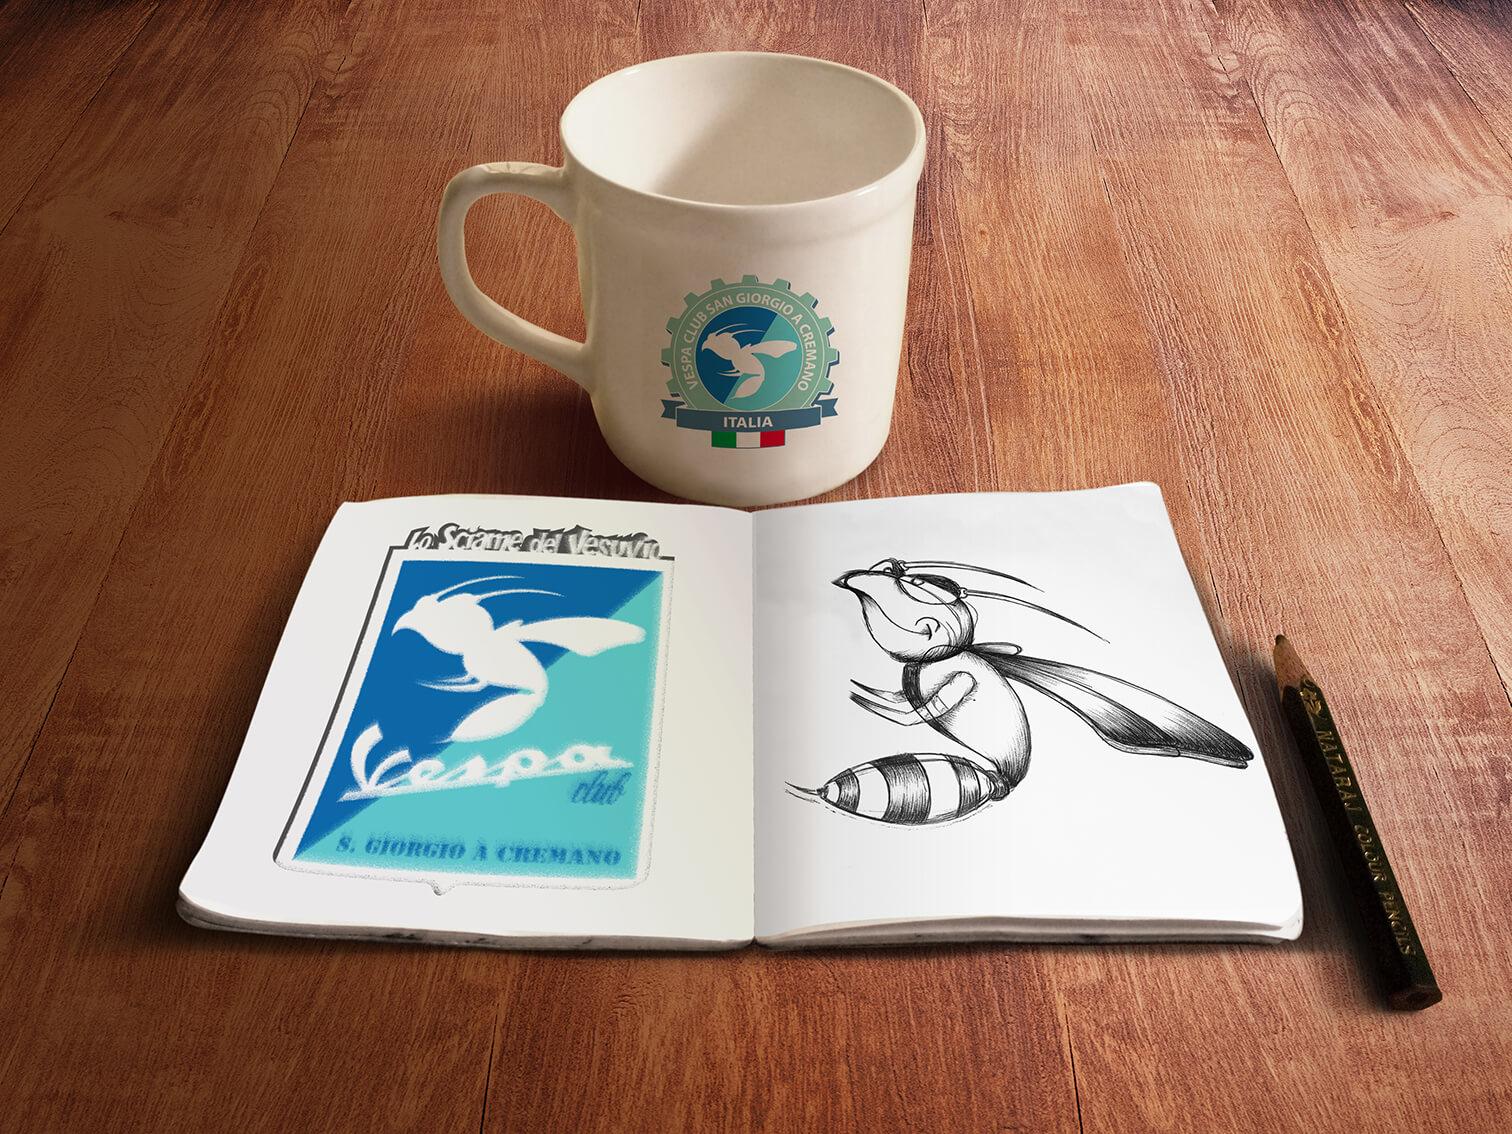 Vespa Club Vesuvio San Giorgio a Cremano book-coffeecup-mockup